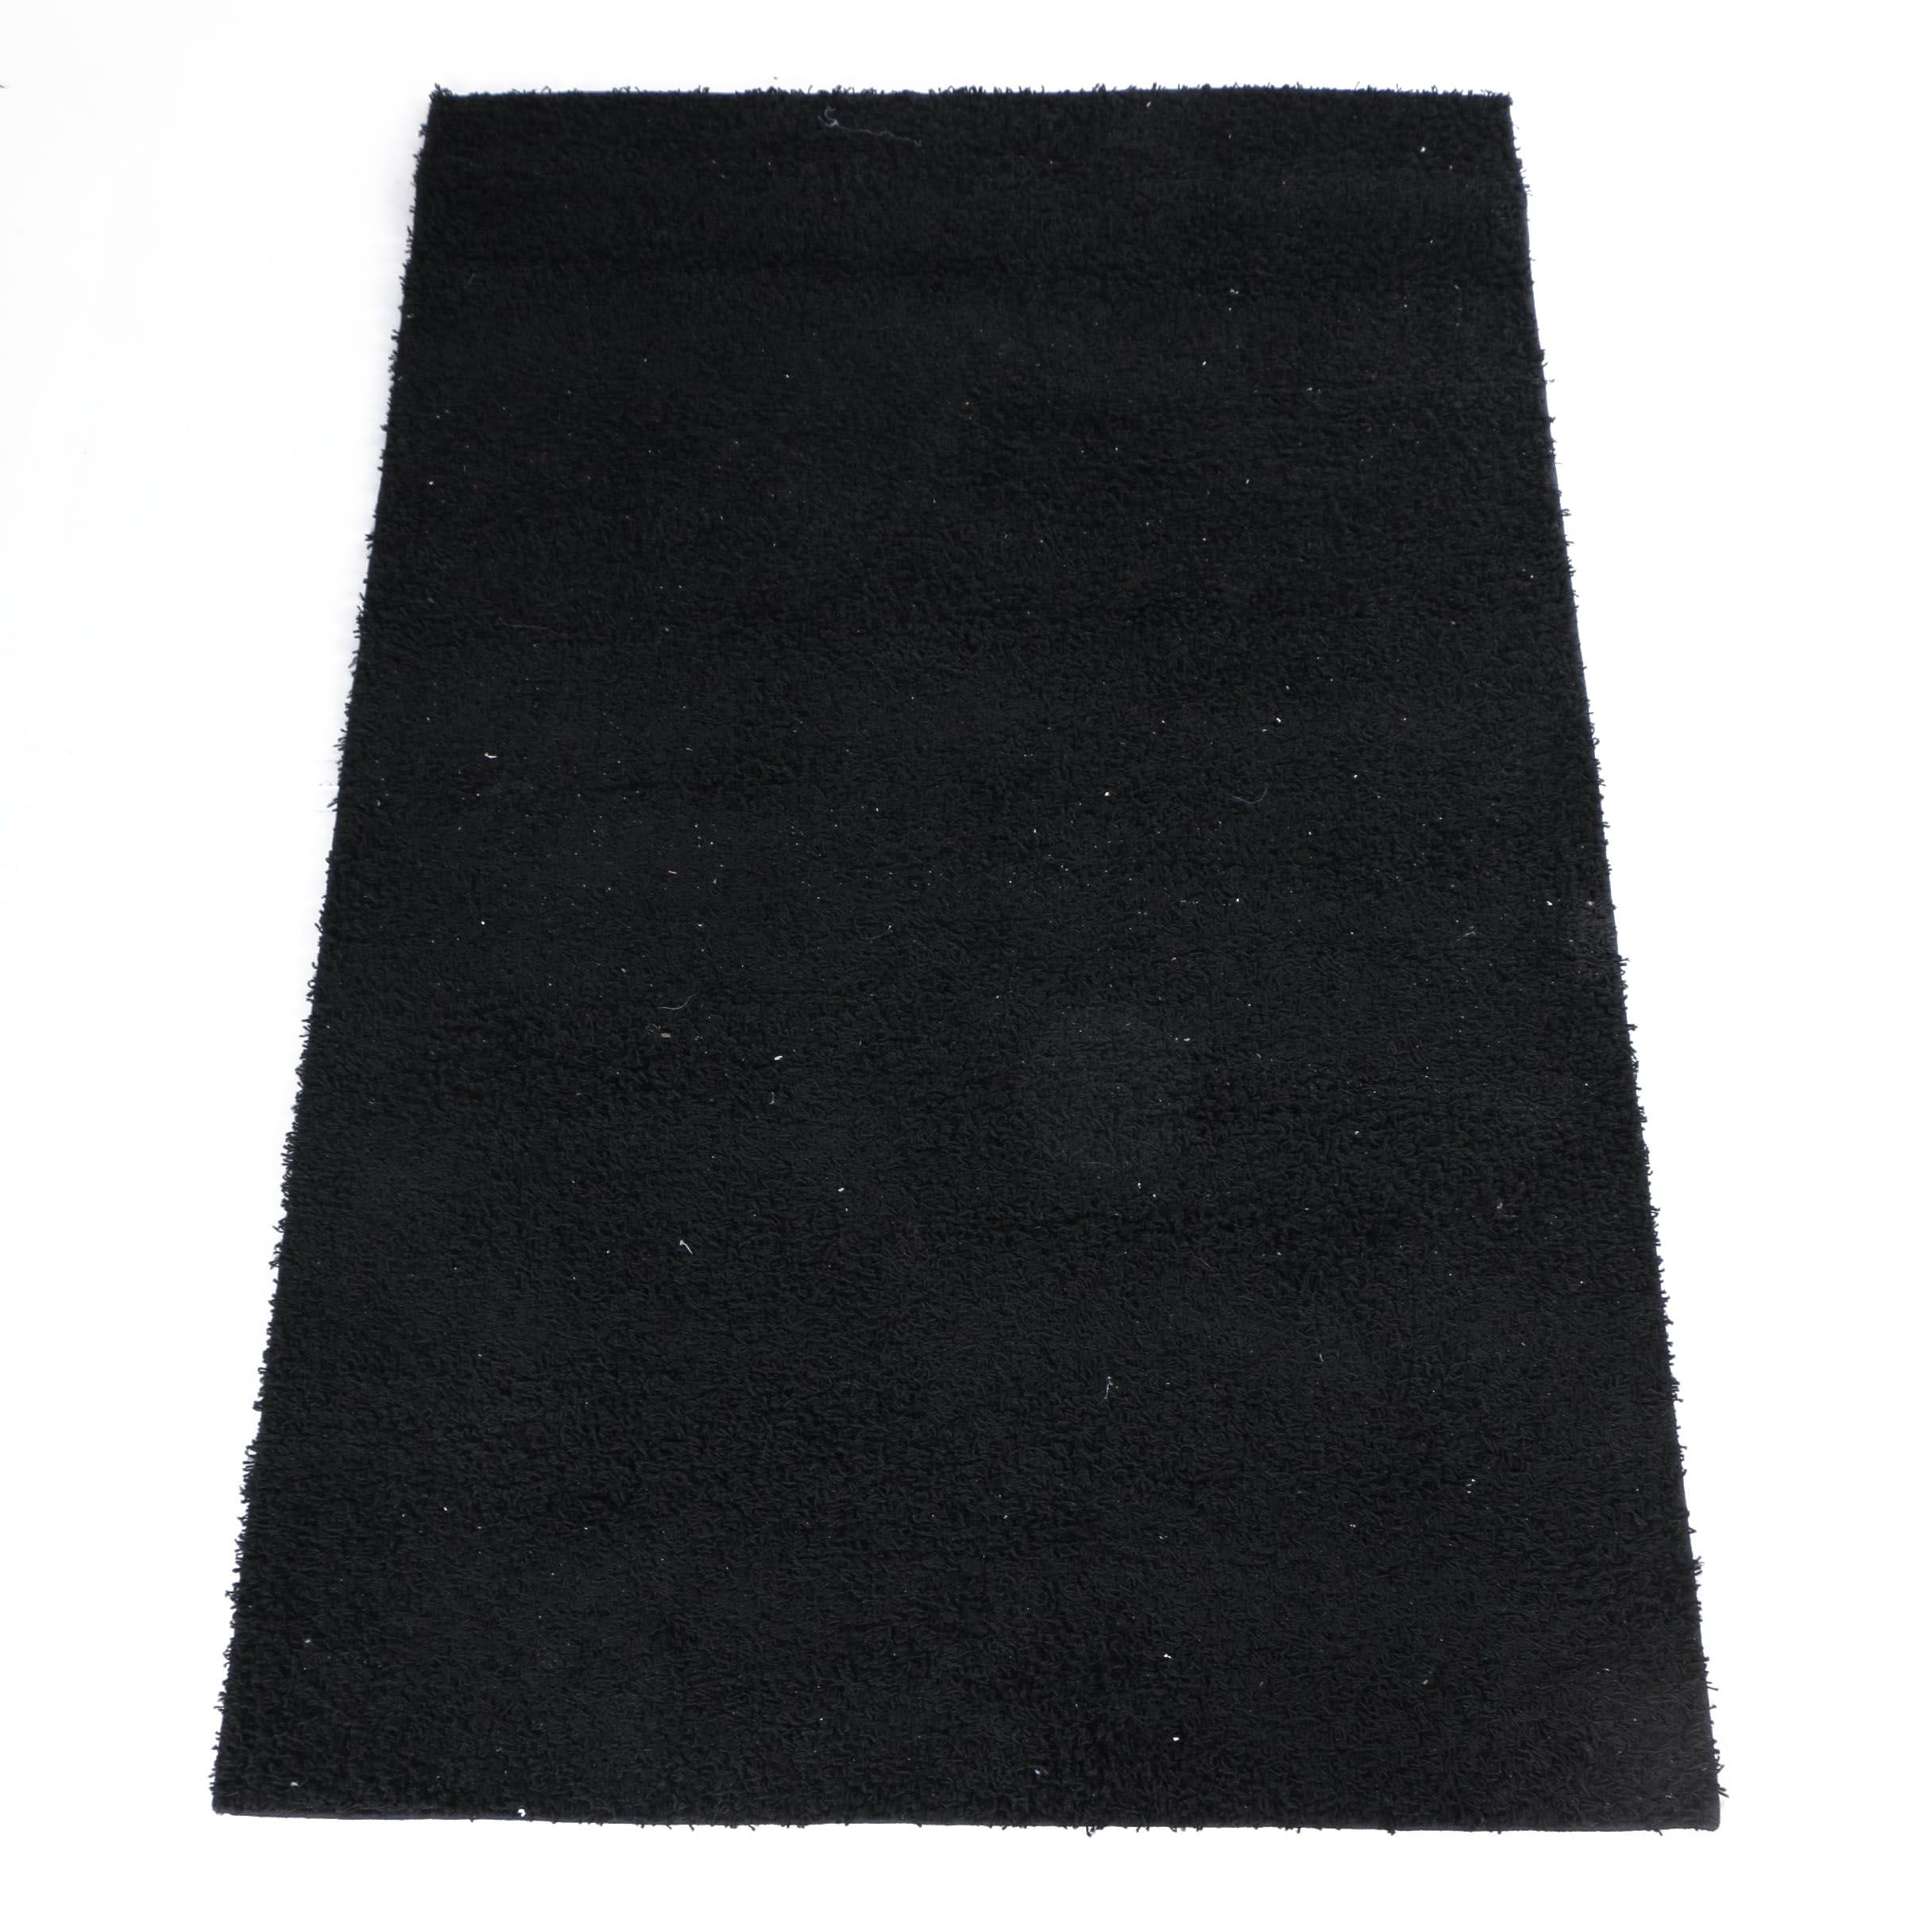 Machine-Made Black Synthetic Shag Area Rug